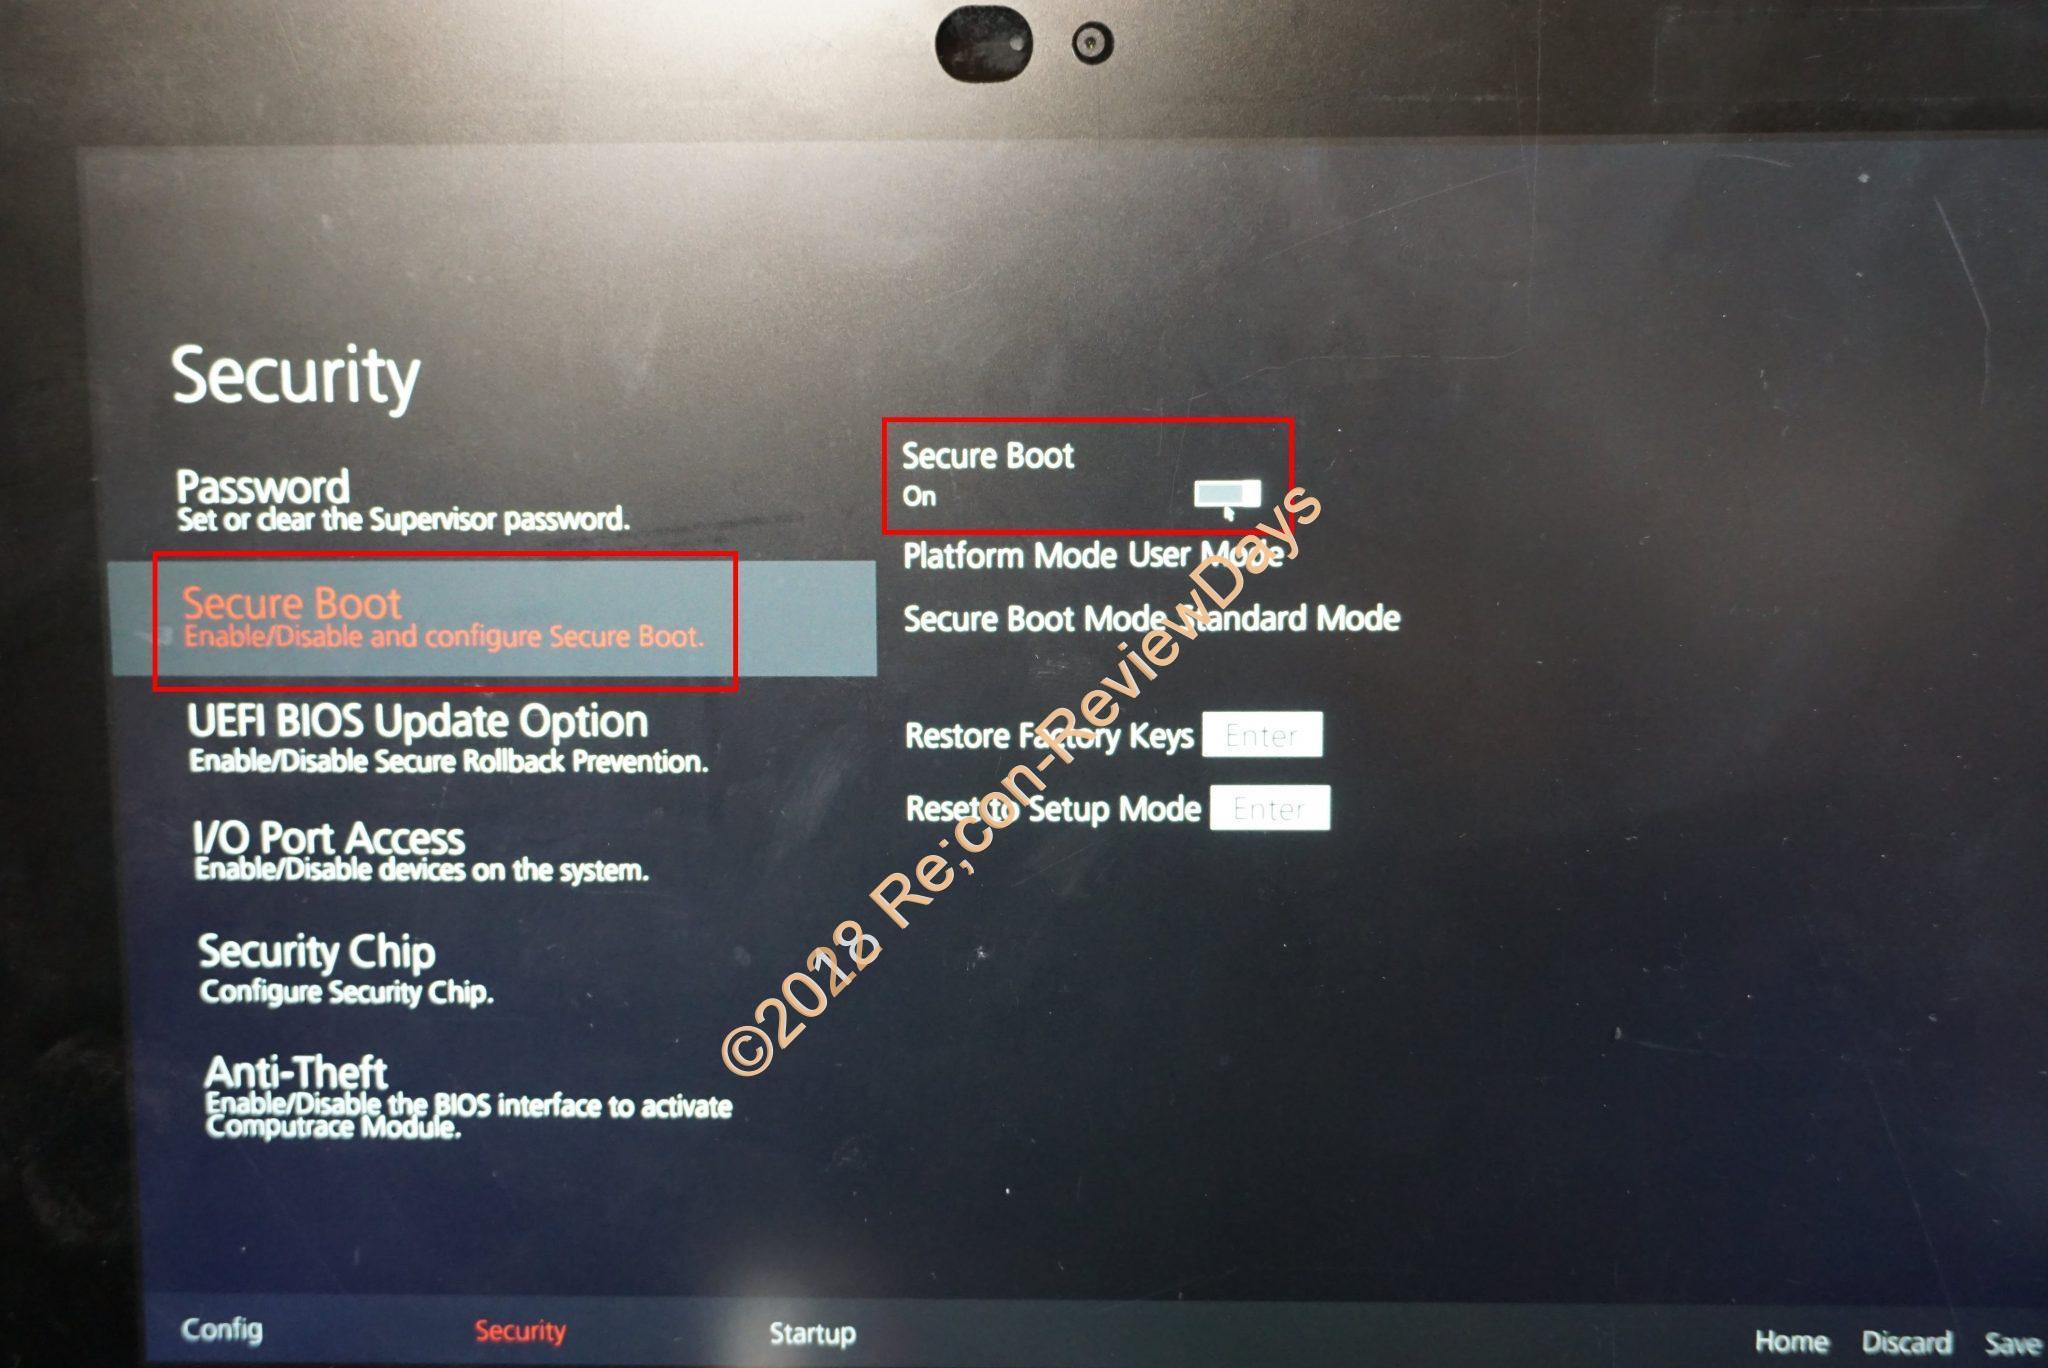 Lenovo Thinkpad 10でOSをインストールする為にUSB Bootを行う方法 #Lenovo  #Thinkpad #Win10